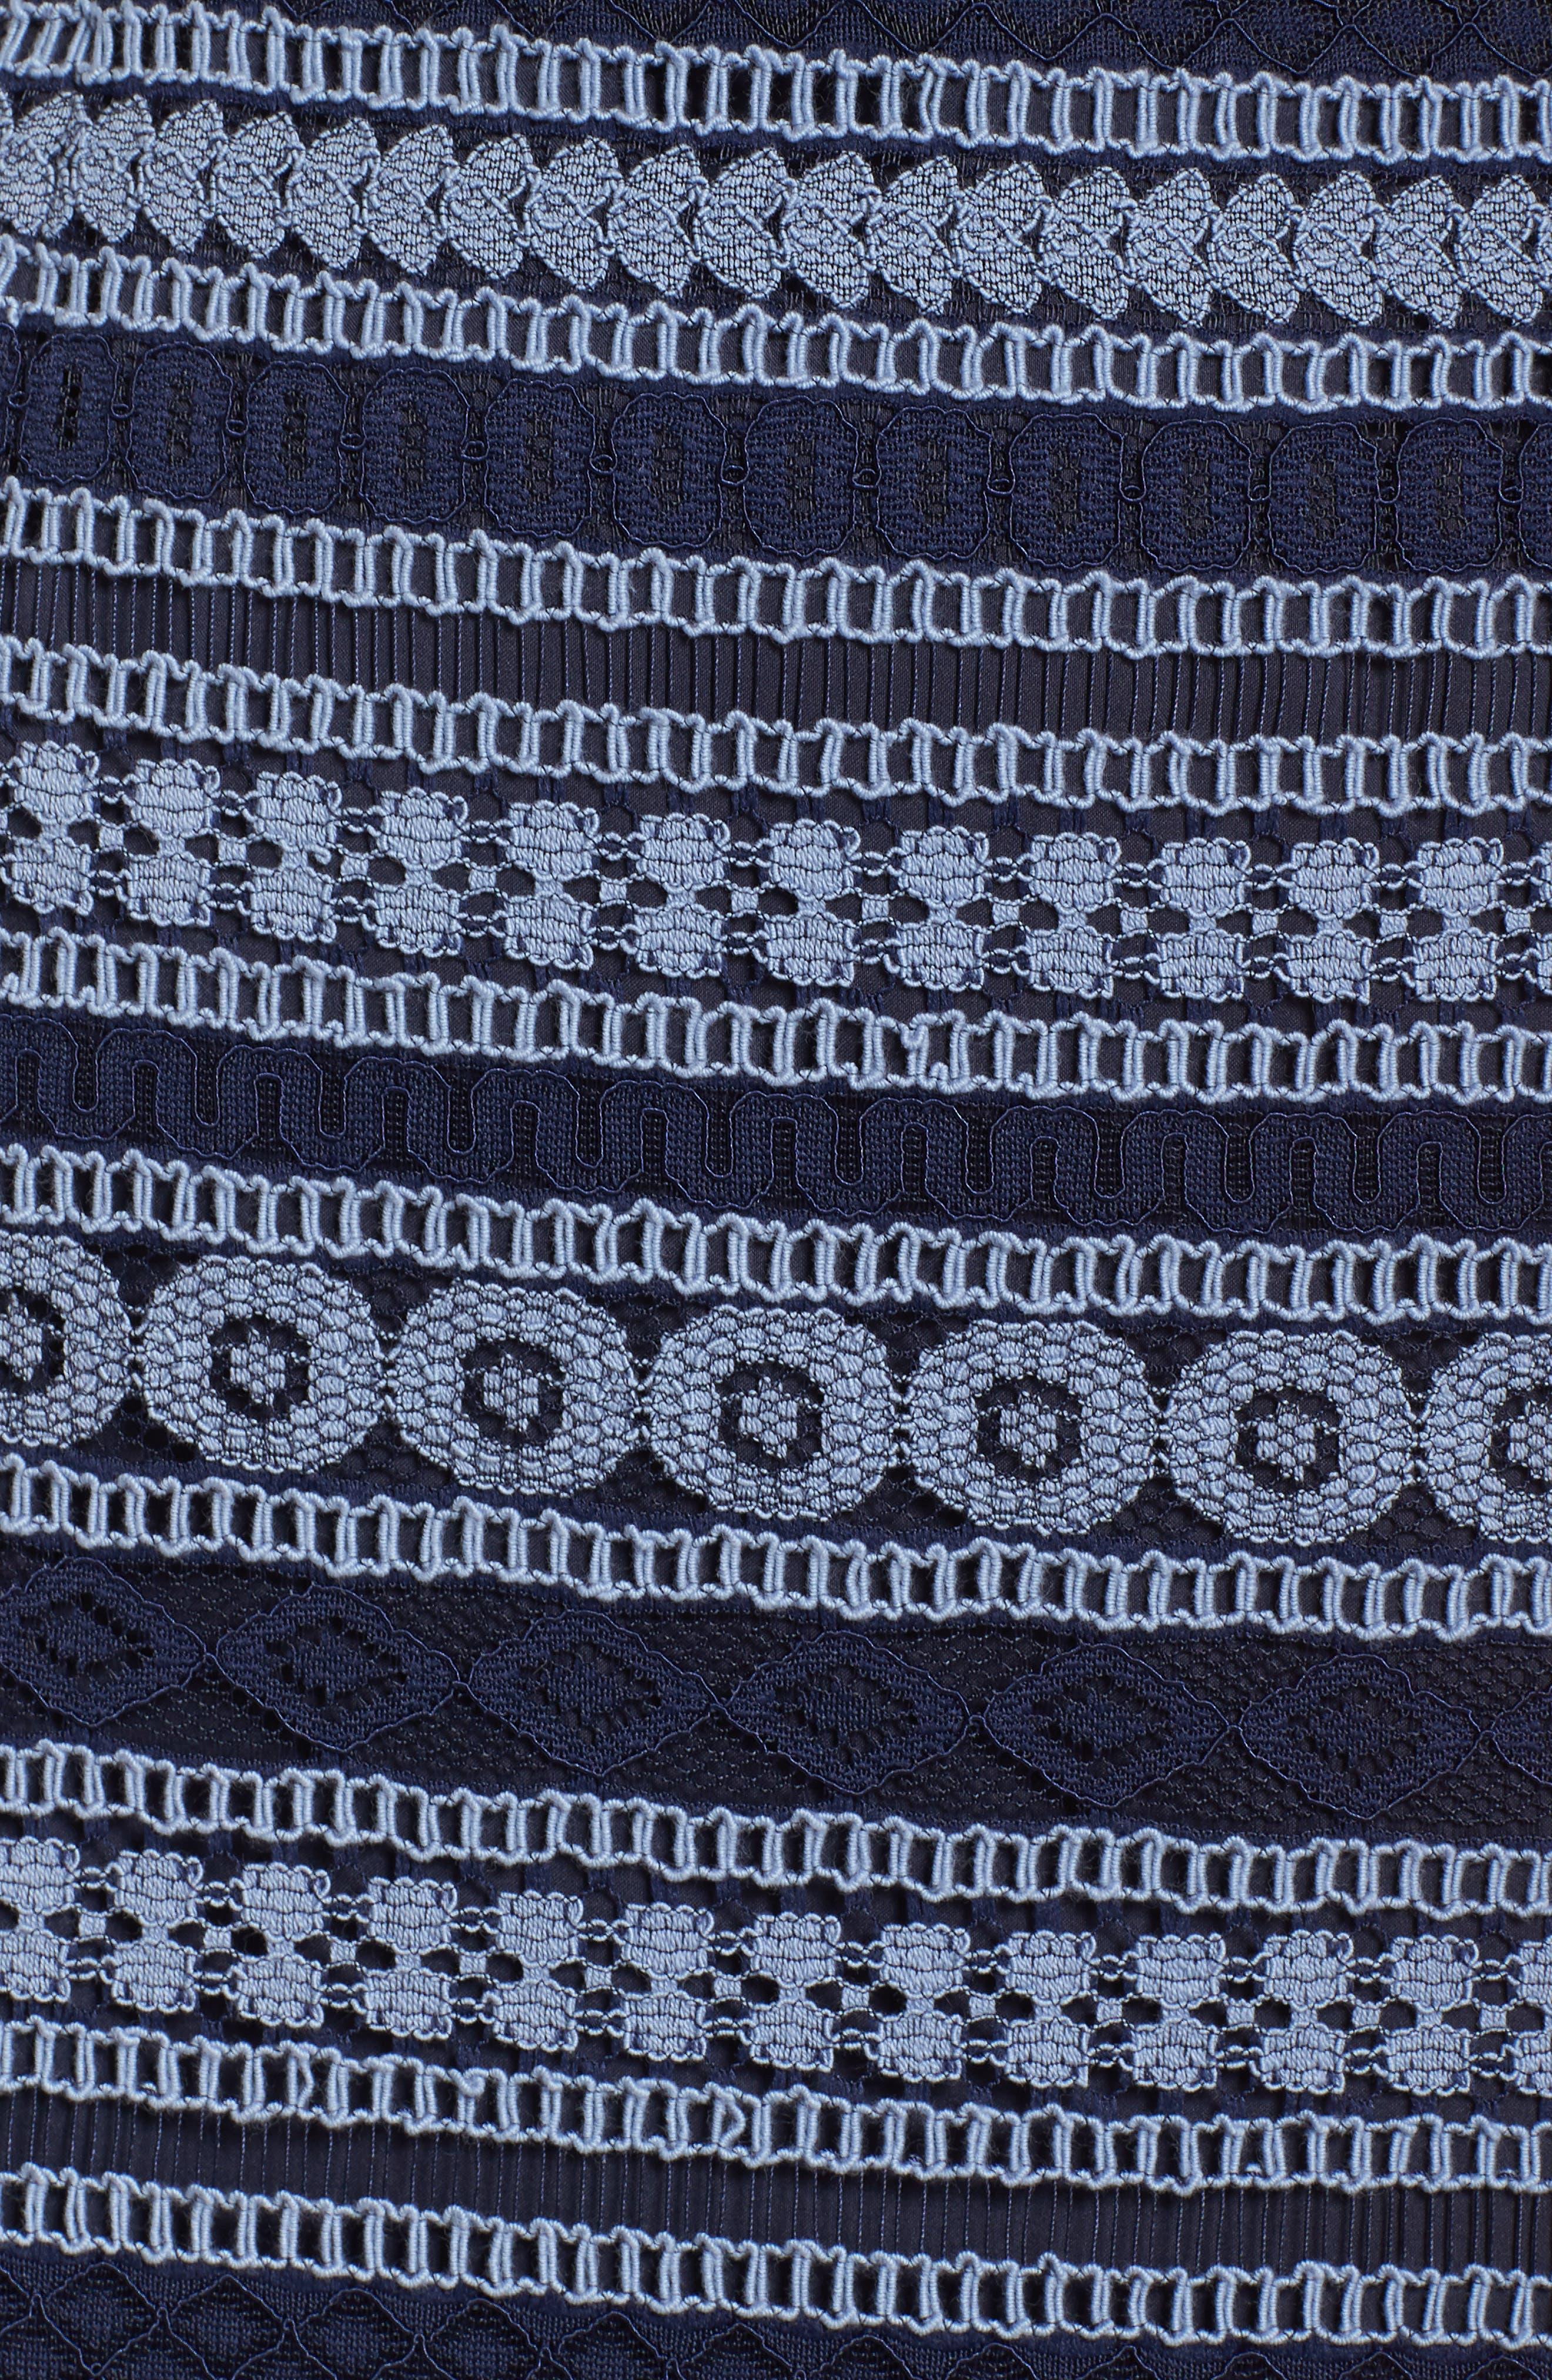 Stripe Racerback Lace Dress,                             Alternate thumbnail 6, color,                             Navy/ Blue